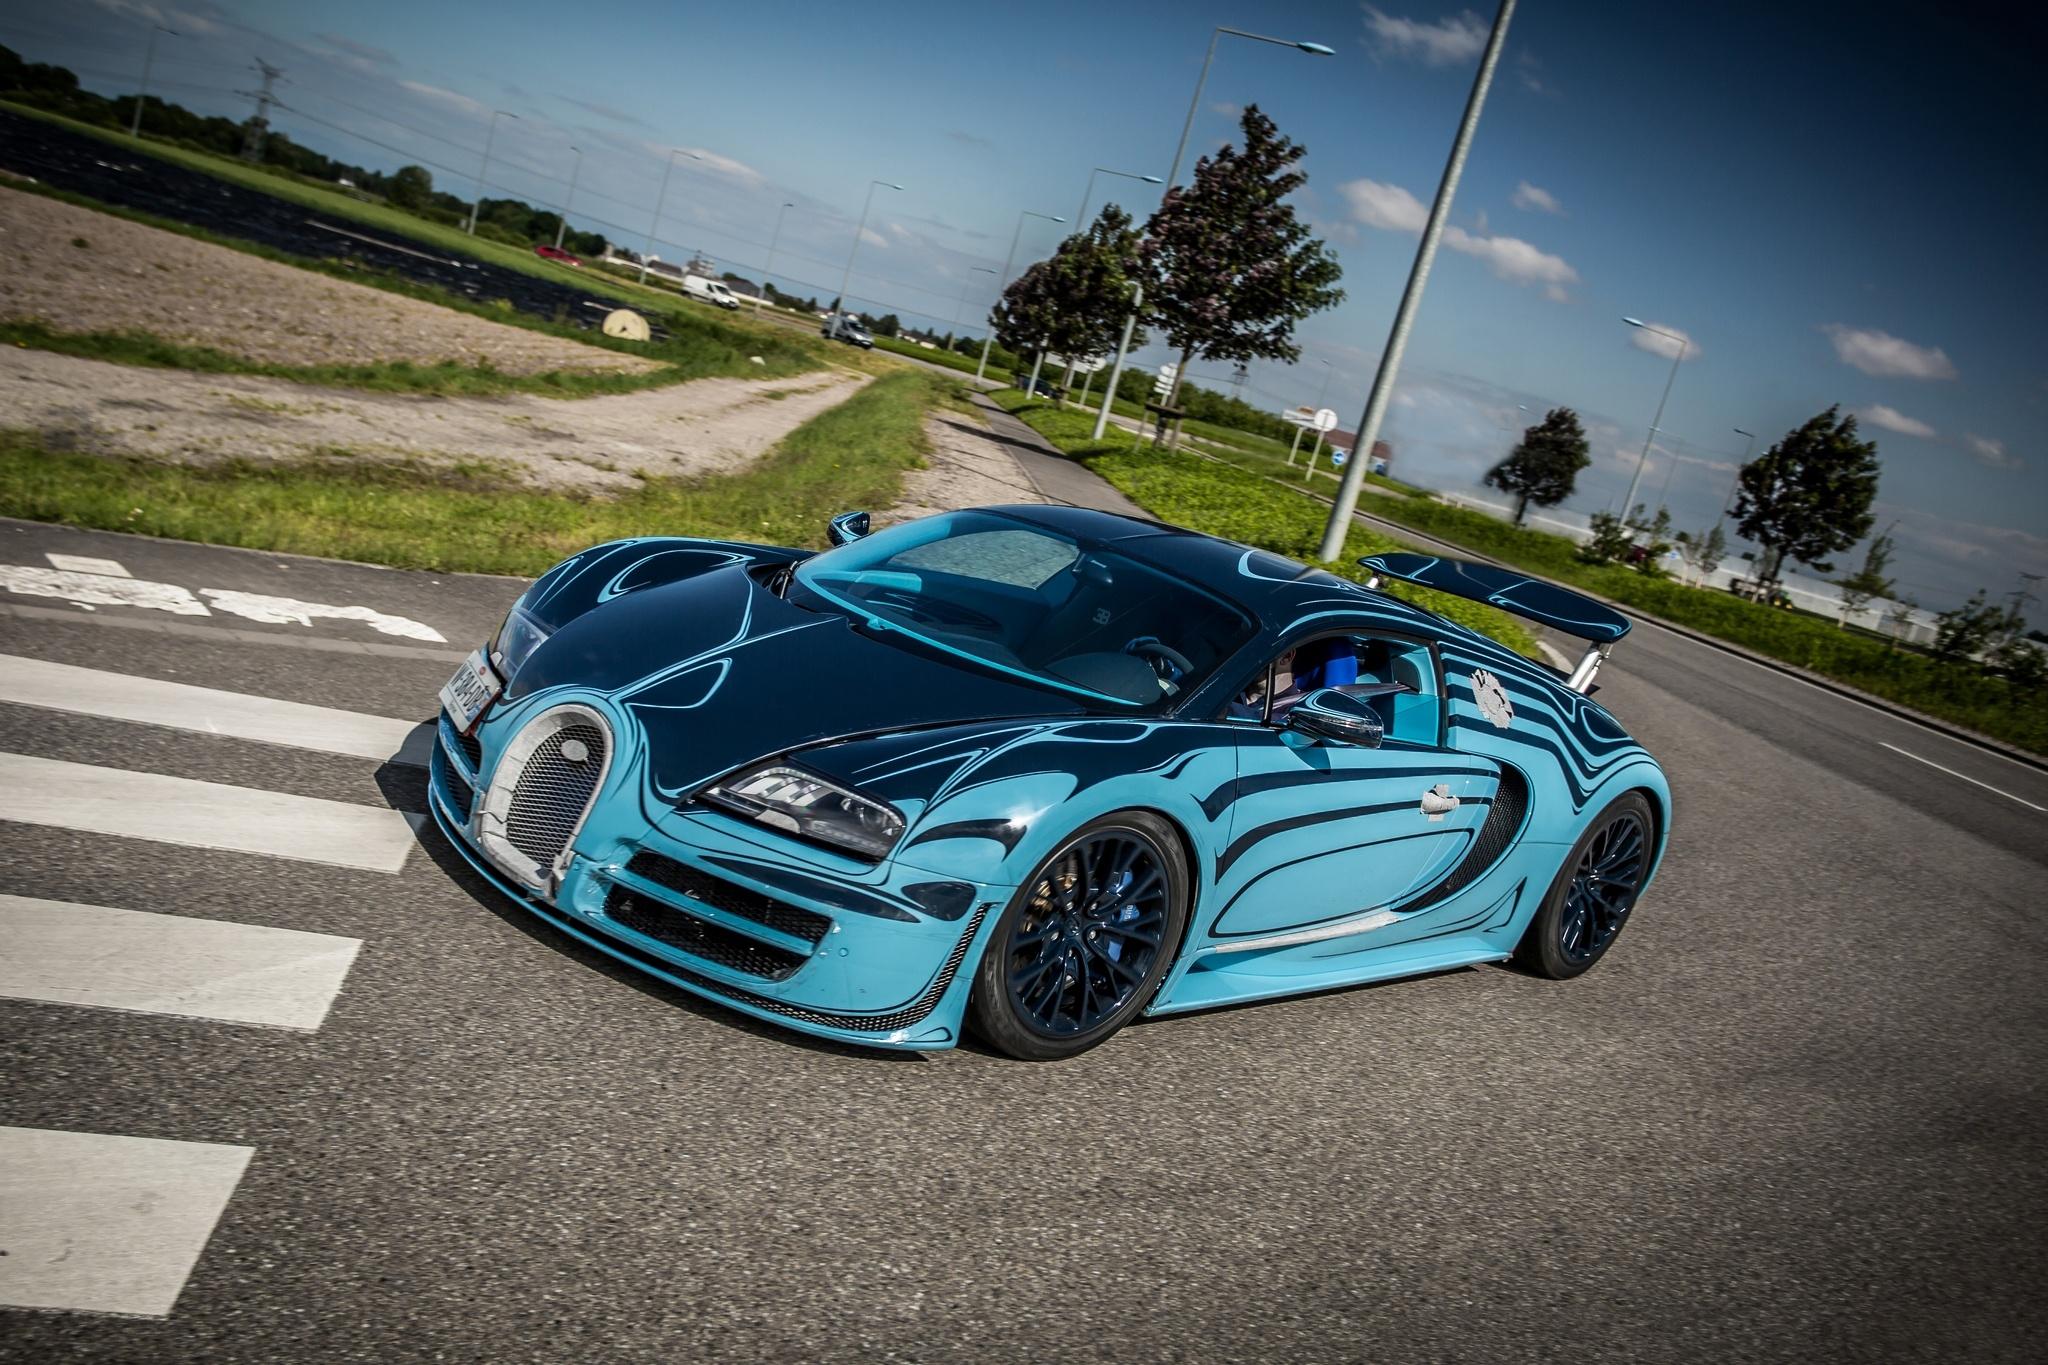 Bugatti Veyron Super Sport Wallpaper: Wallpaper : Bugatti, Veyron, Super, Sport, Saphir Bleu